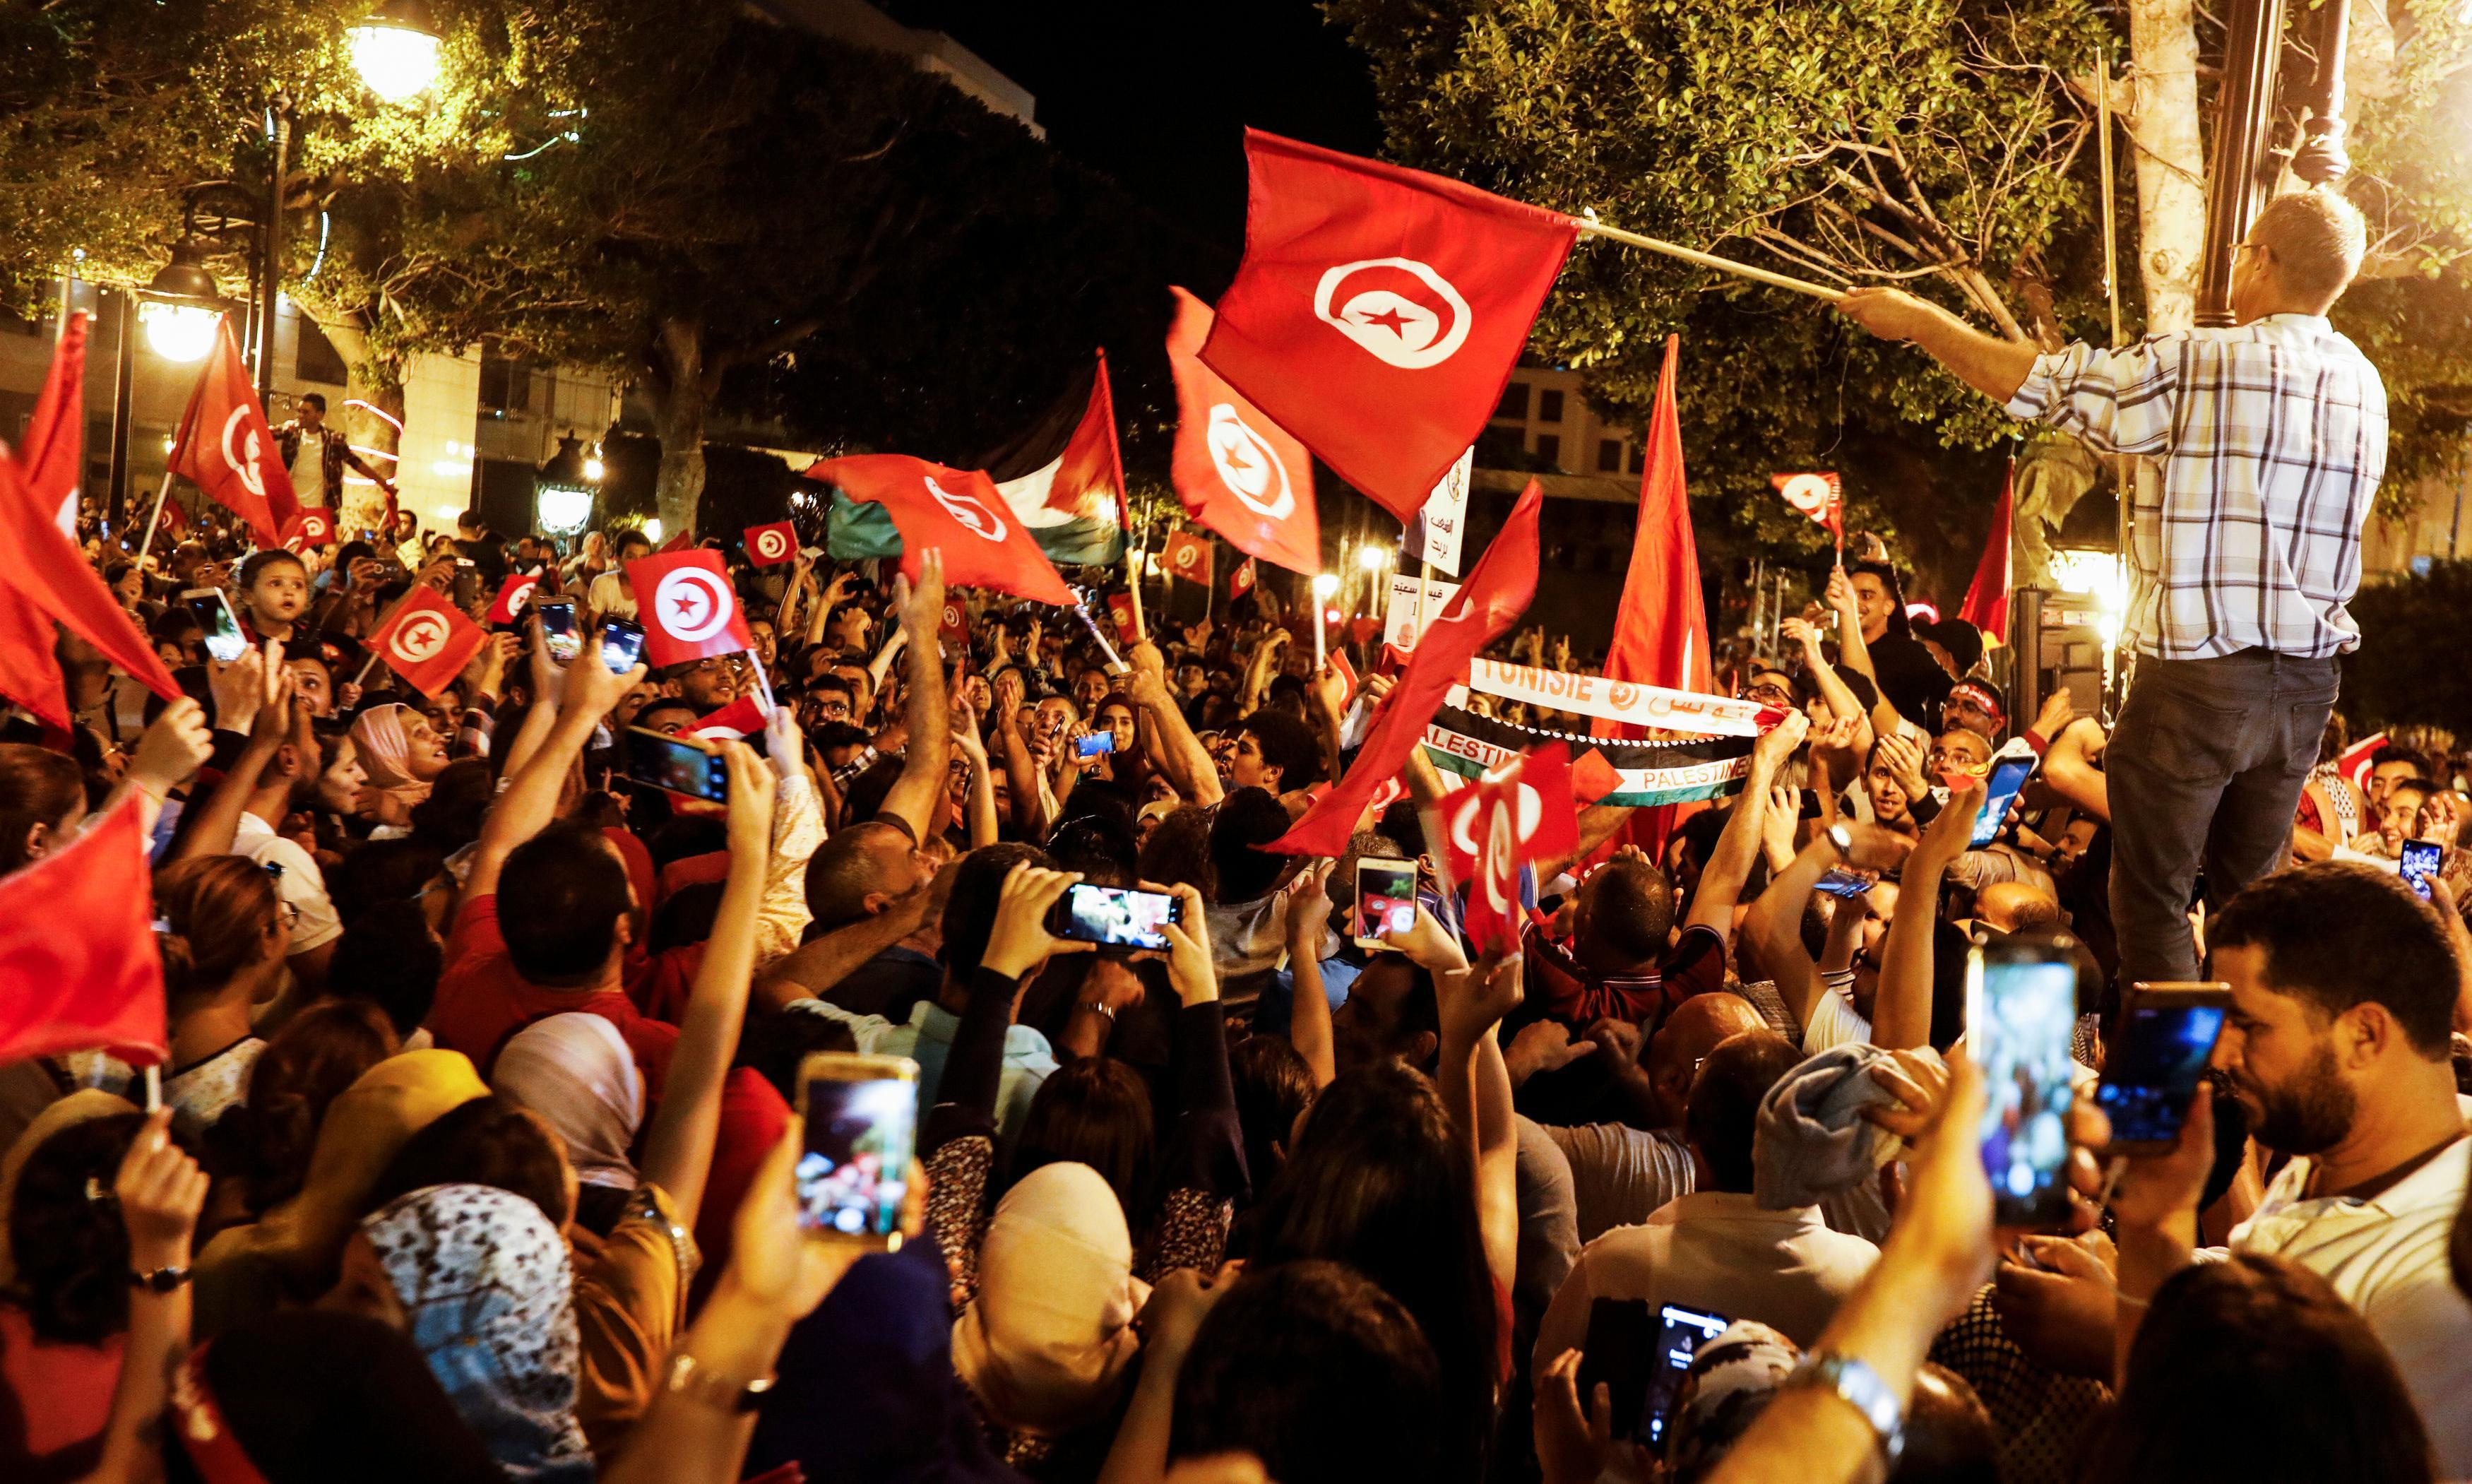 Tunisia election: 'Robocop' Kais Saied wins presidential runoff